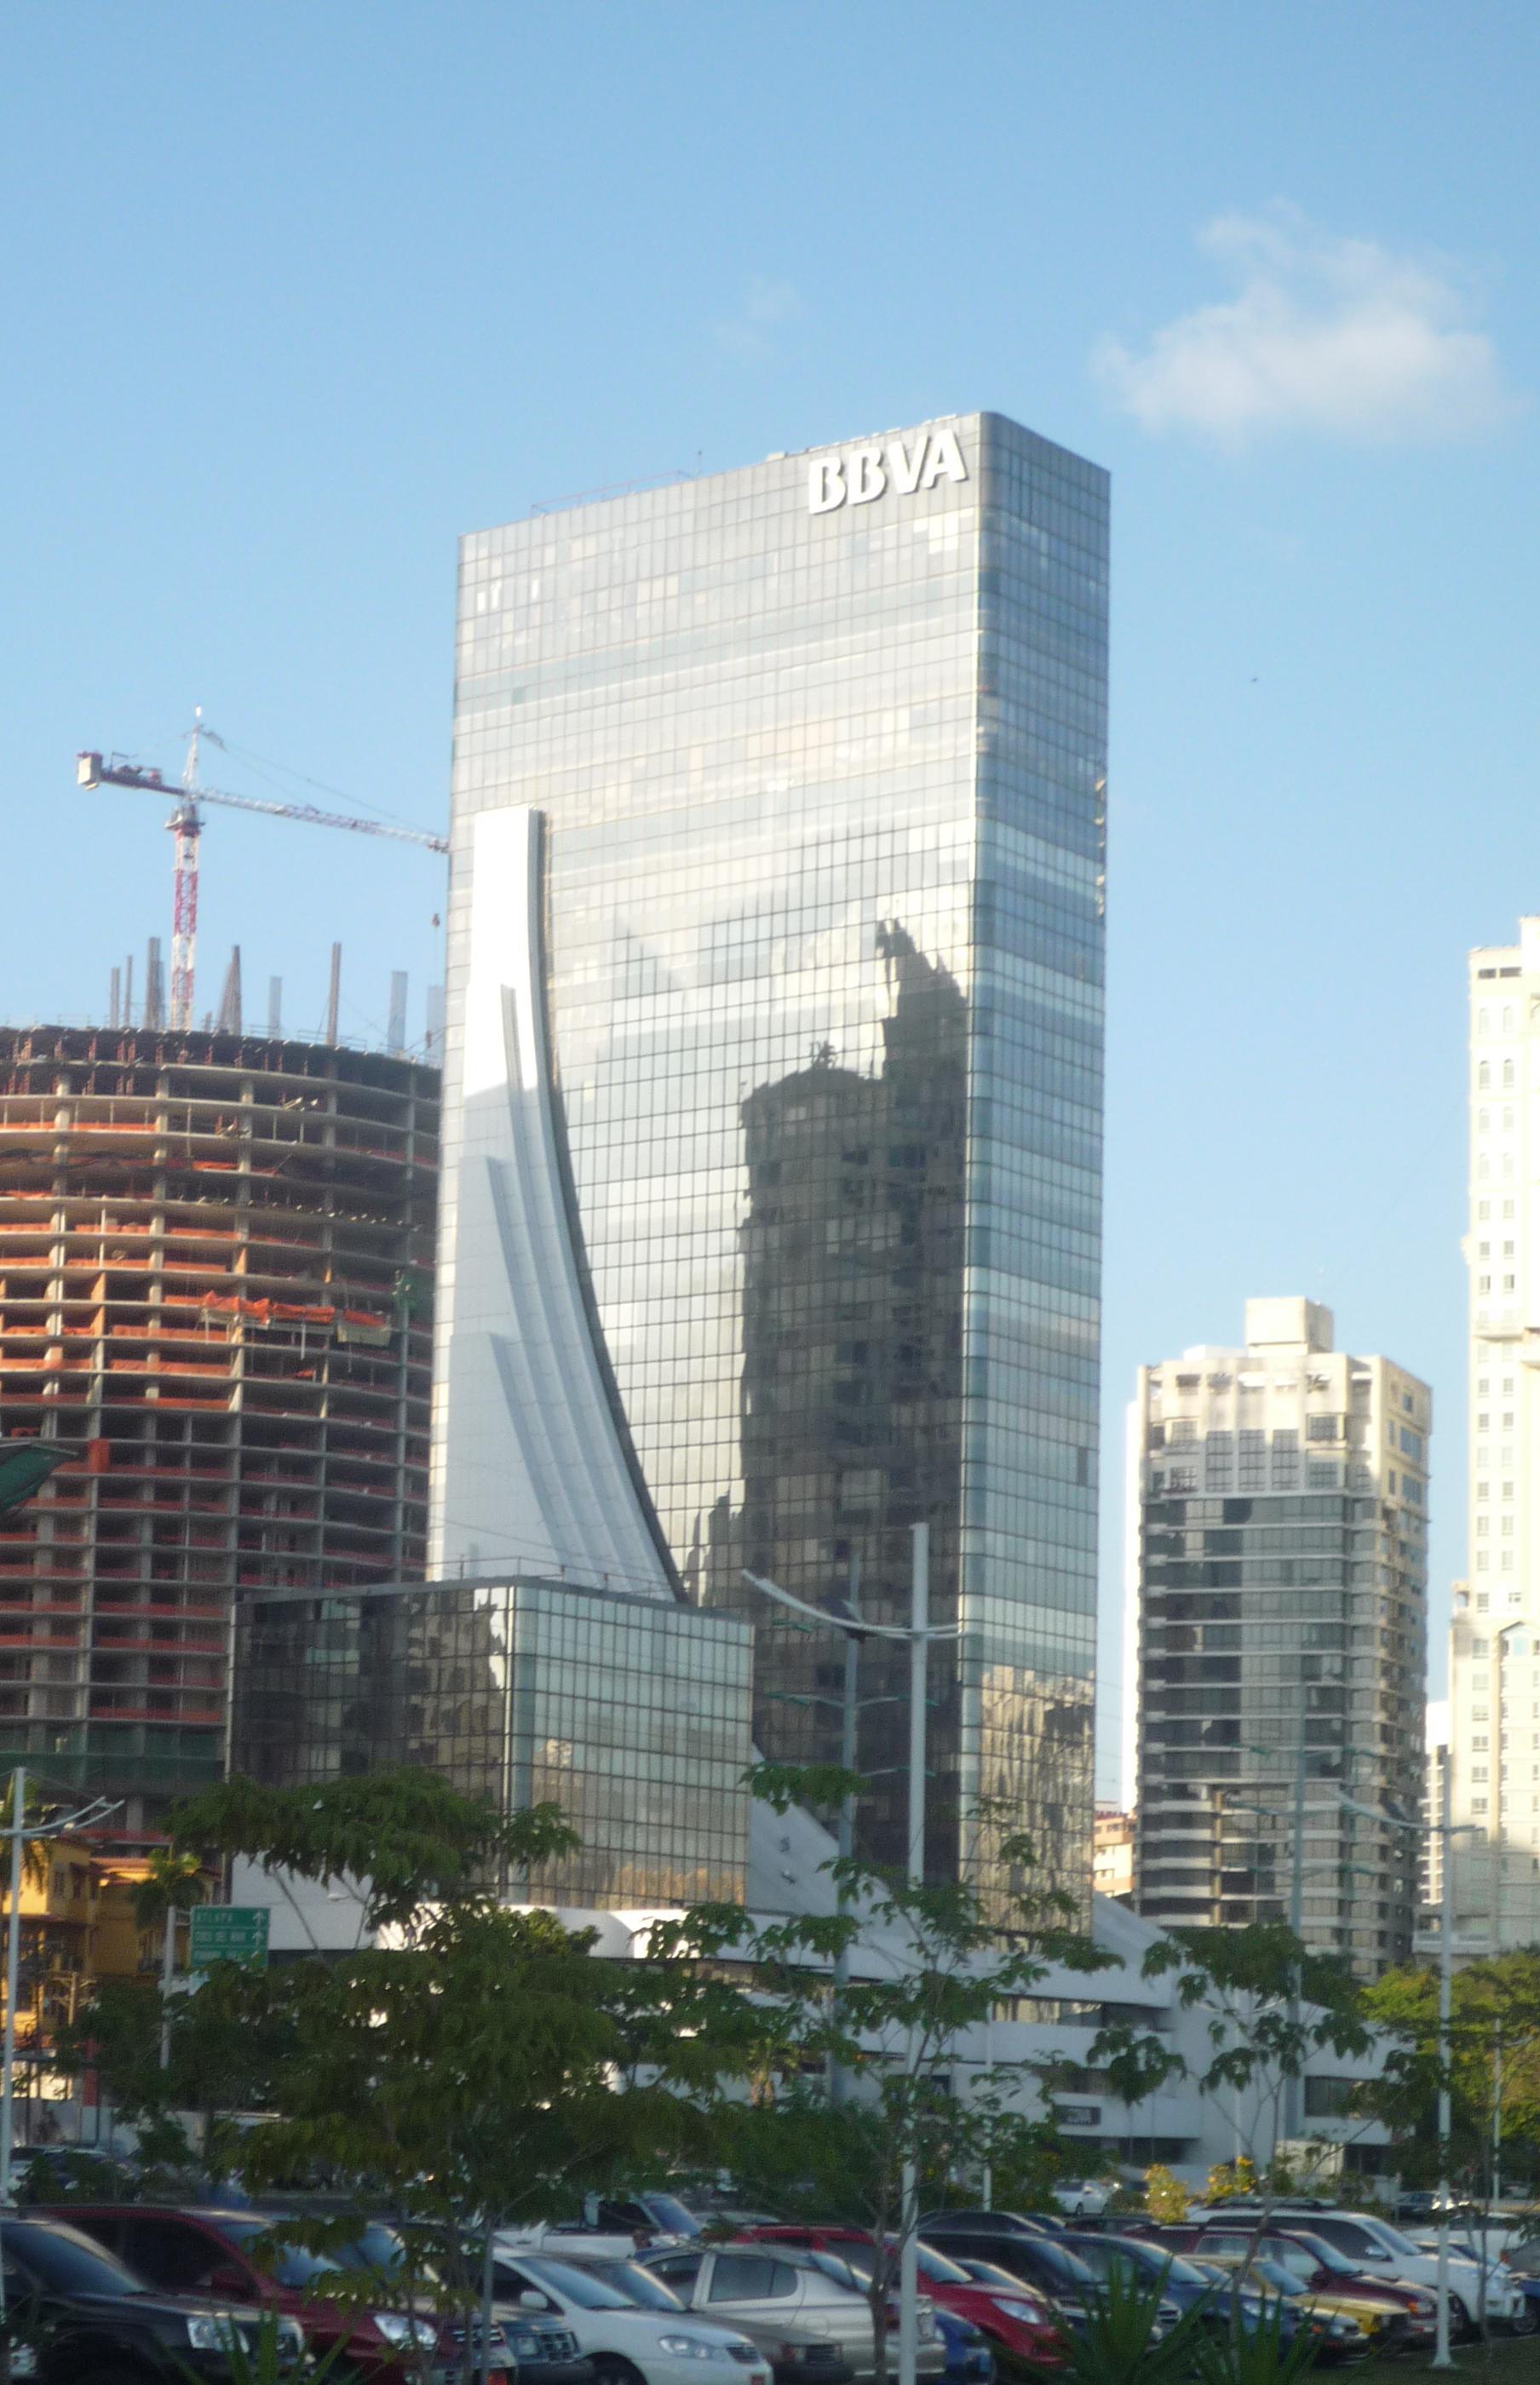 Torre bbva panam wikipedia la enciclopedia libre for Numero del banco exterior